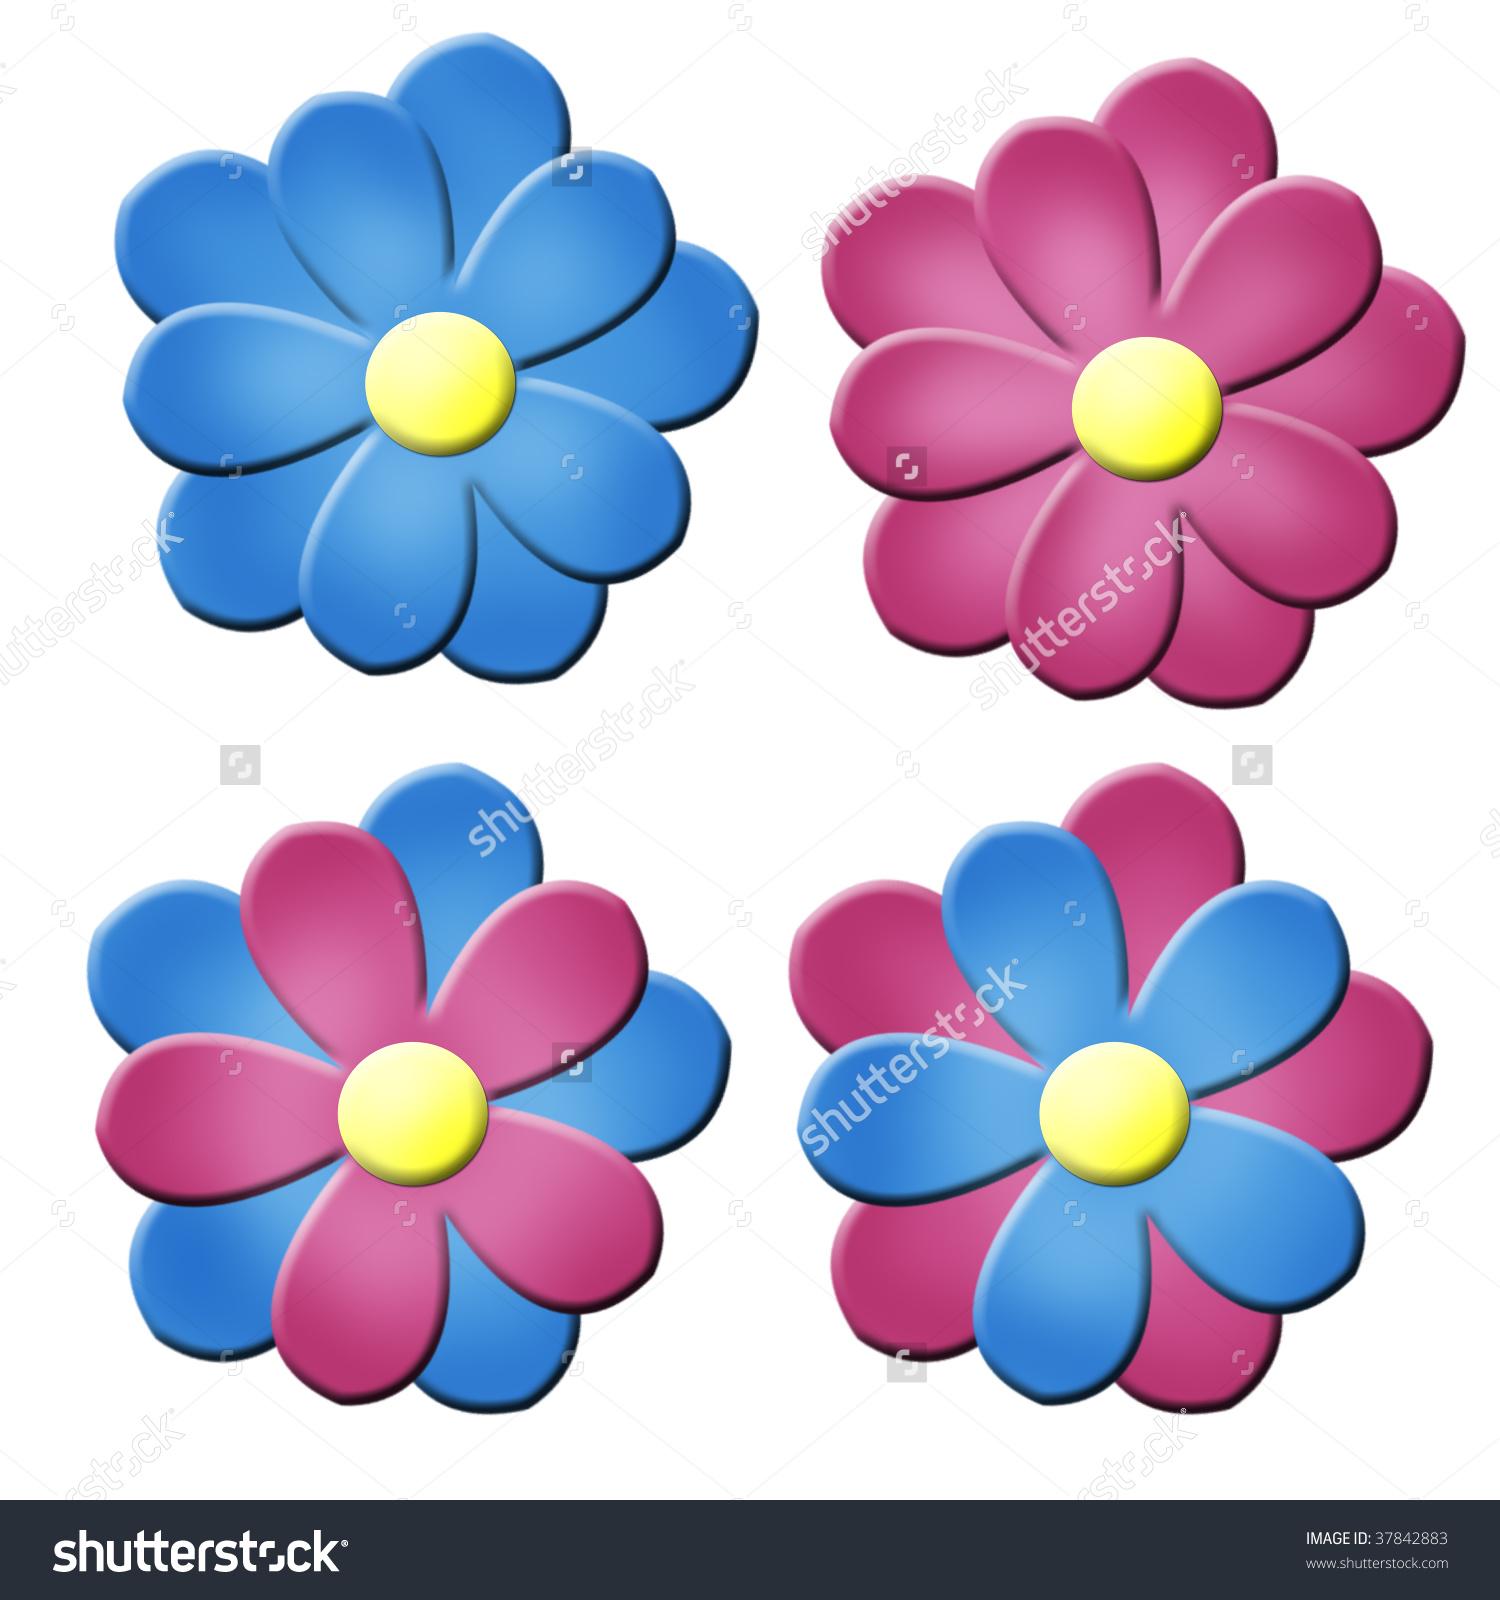 Florets As Clipart. Stock Photo 37842883 : Shutterstock.